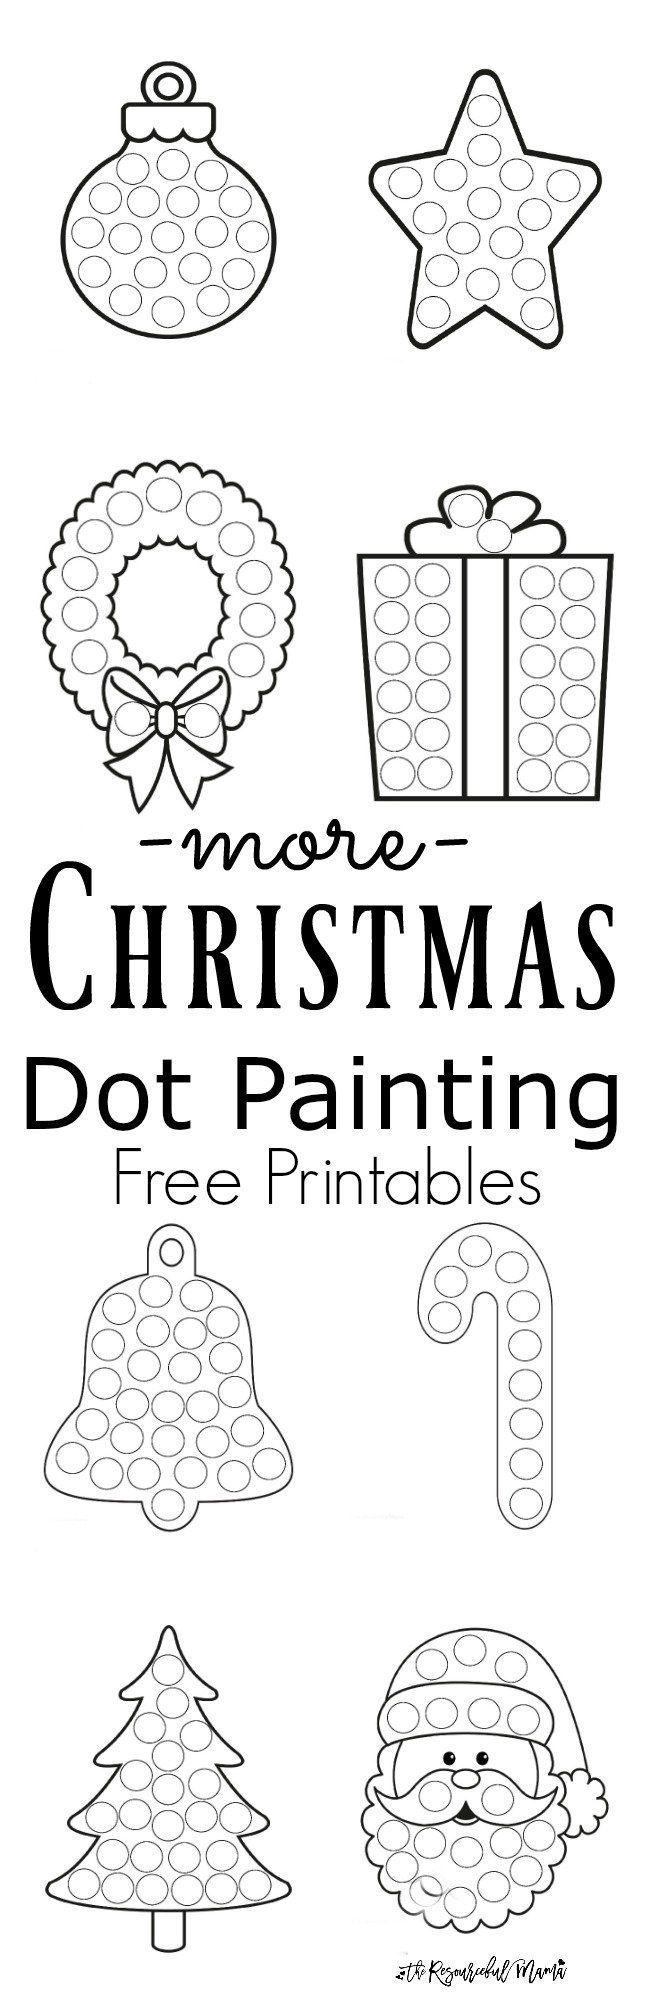 more christmas dot painting free printables dot painting kid